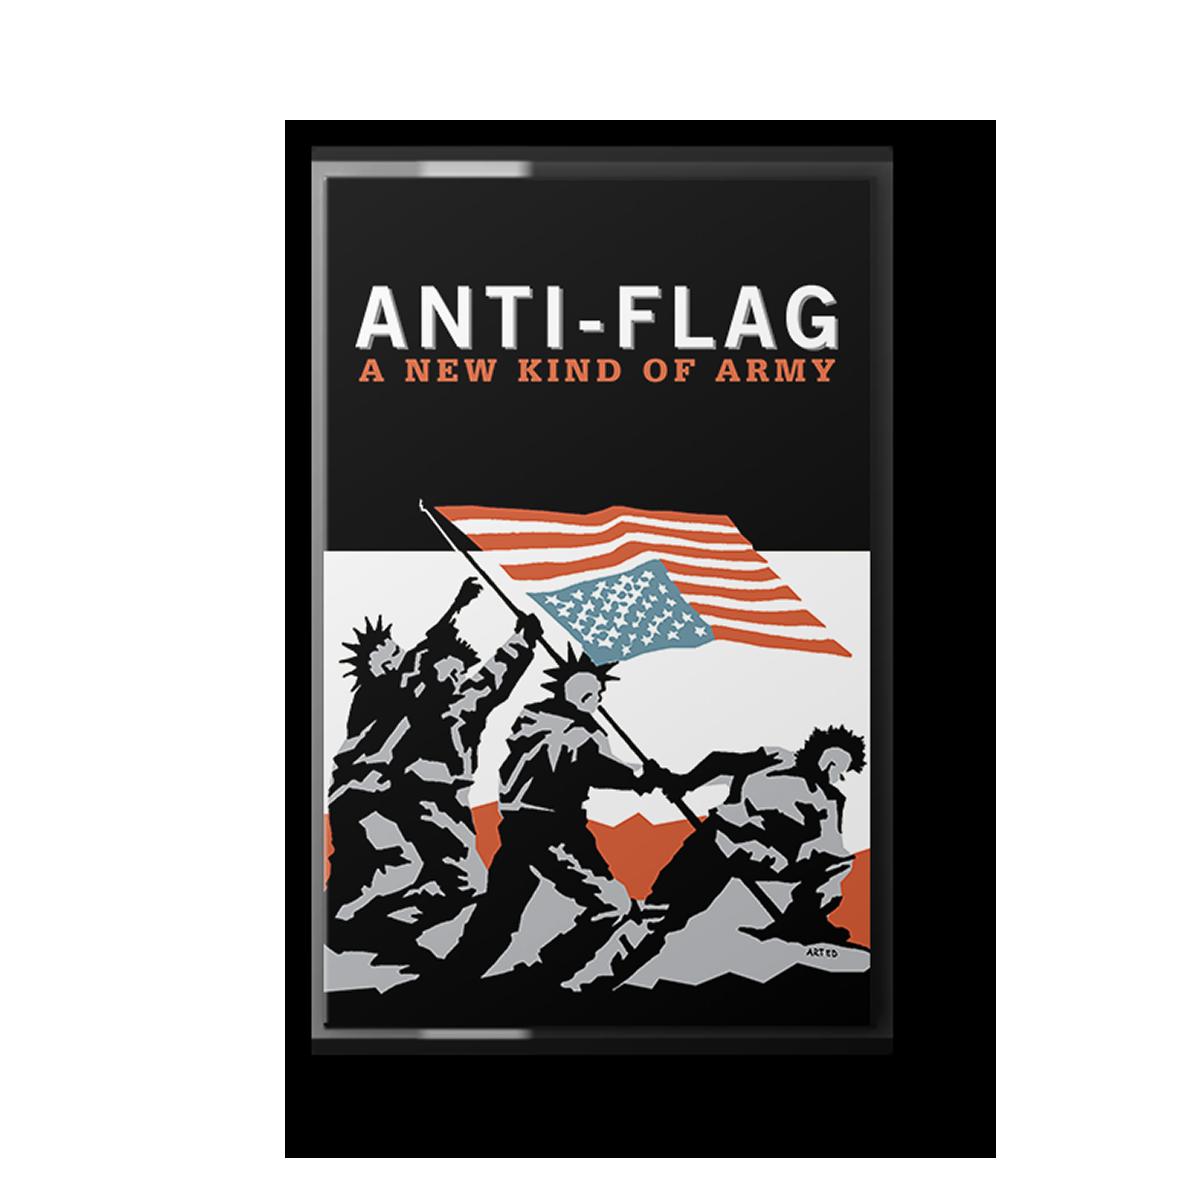 antiflag-tape-cover-1_1200x.3dc5a1ac556f4ece8fd7d643d4d6d966.png